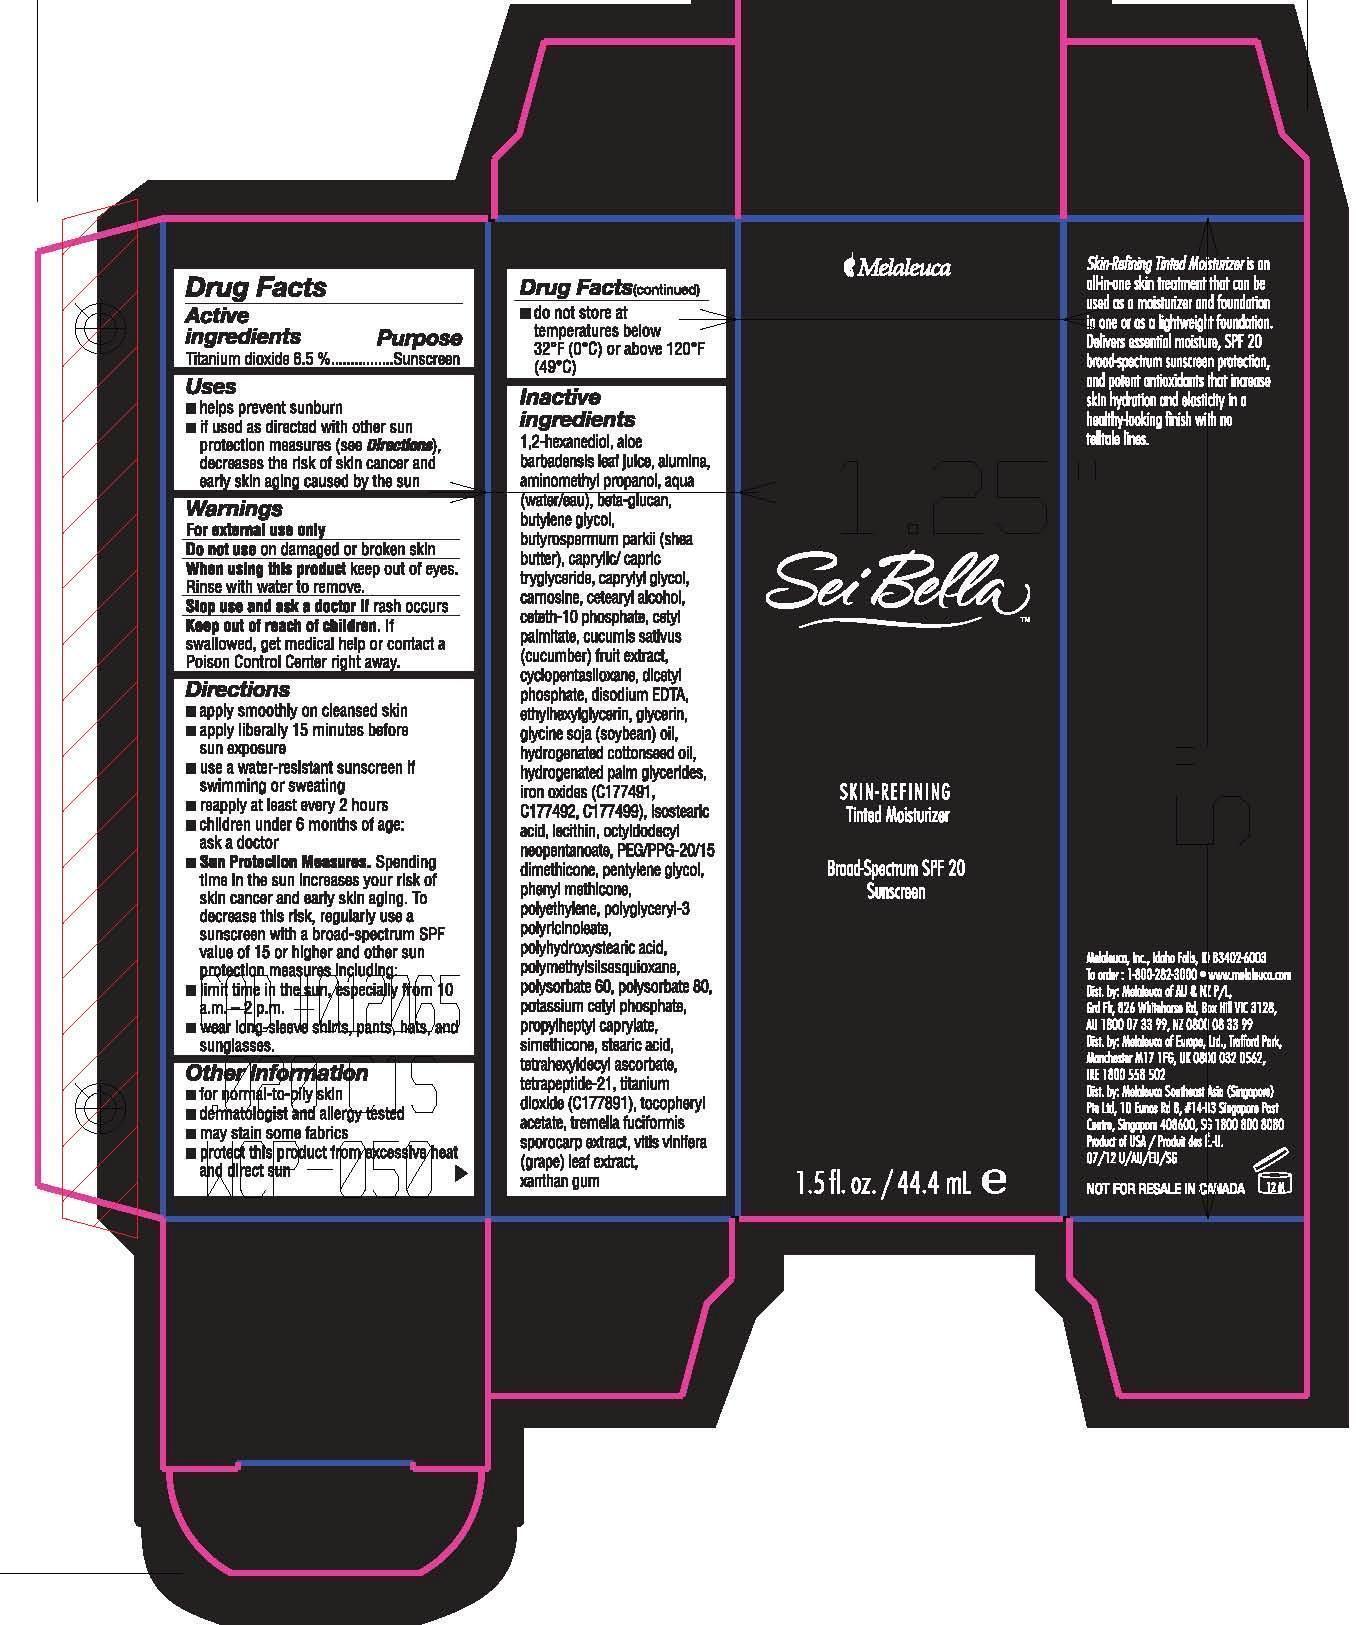 Sei Bella Skin Refining Tinted Moisturizer Procelain (Titanium Dioxide) Lotion [Melaleuca Inc.]